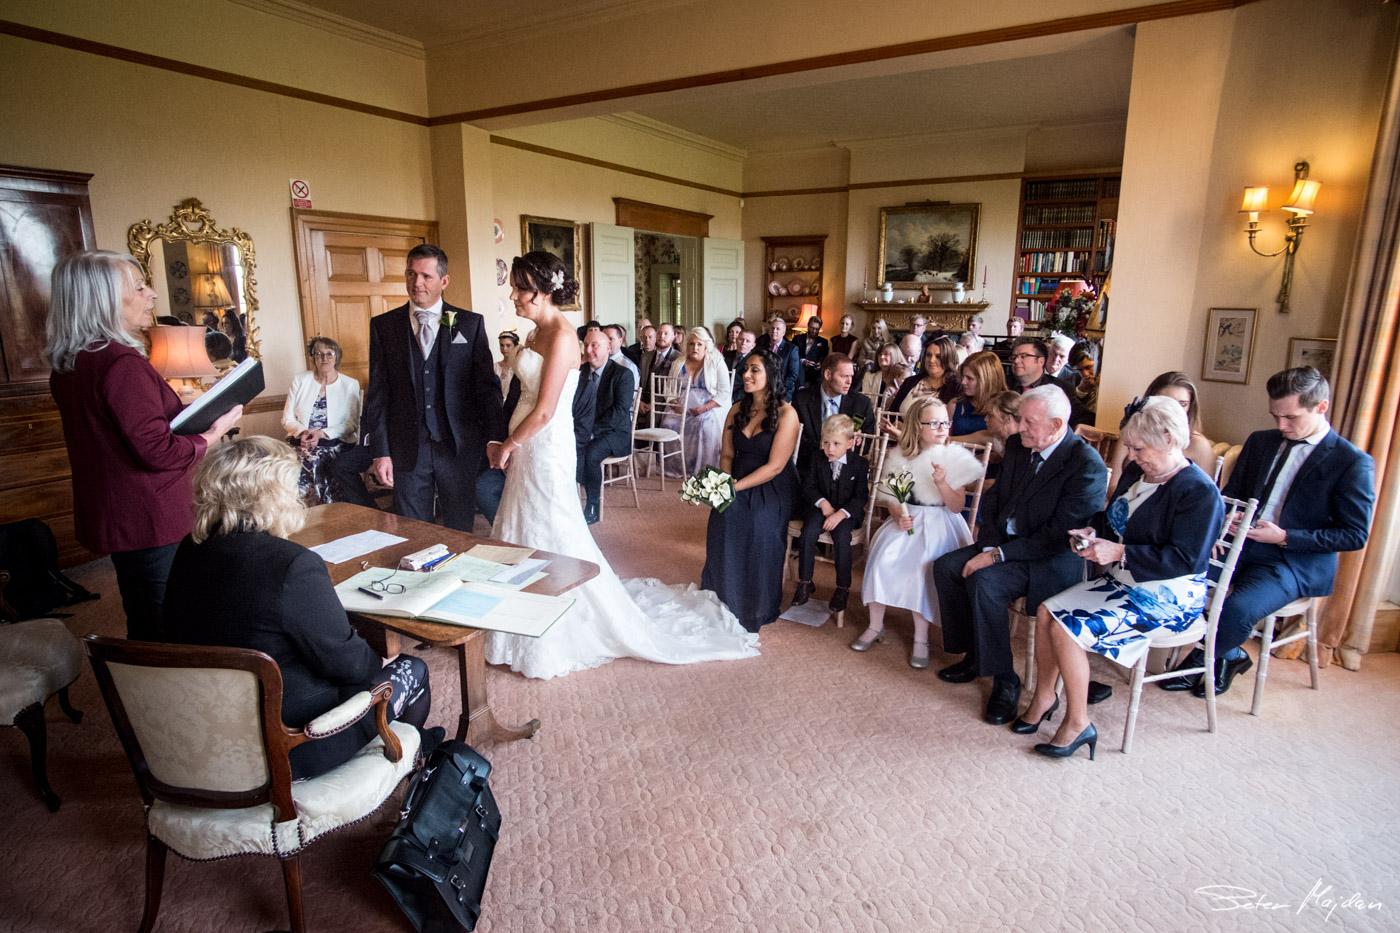 east-bridgford-hill-wedding-photography-28.jpg